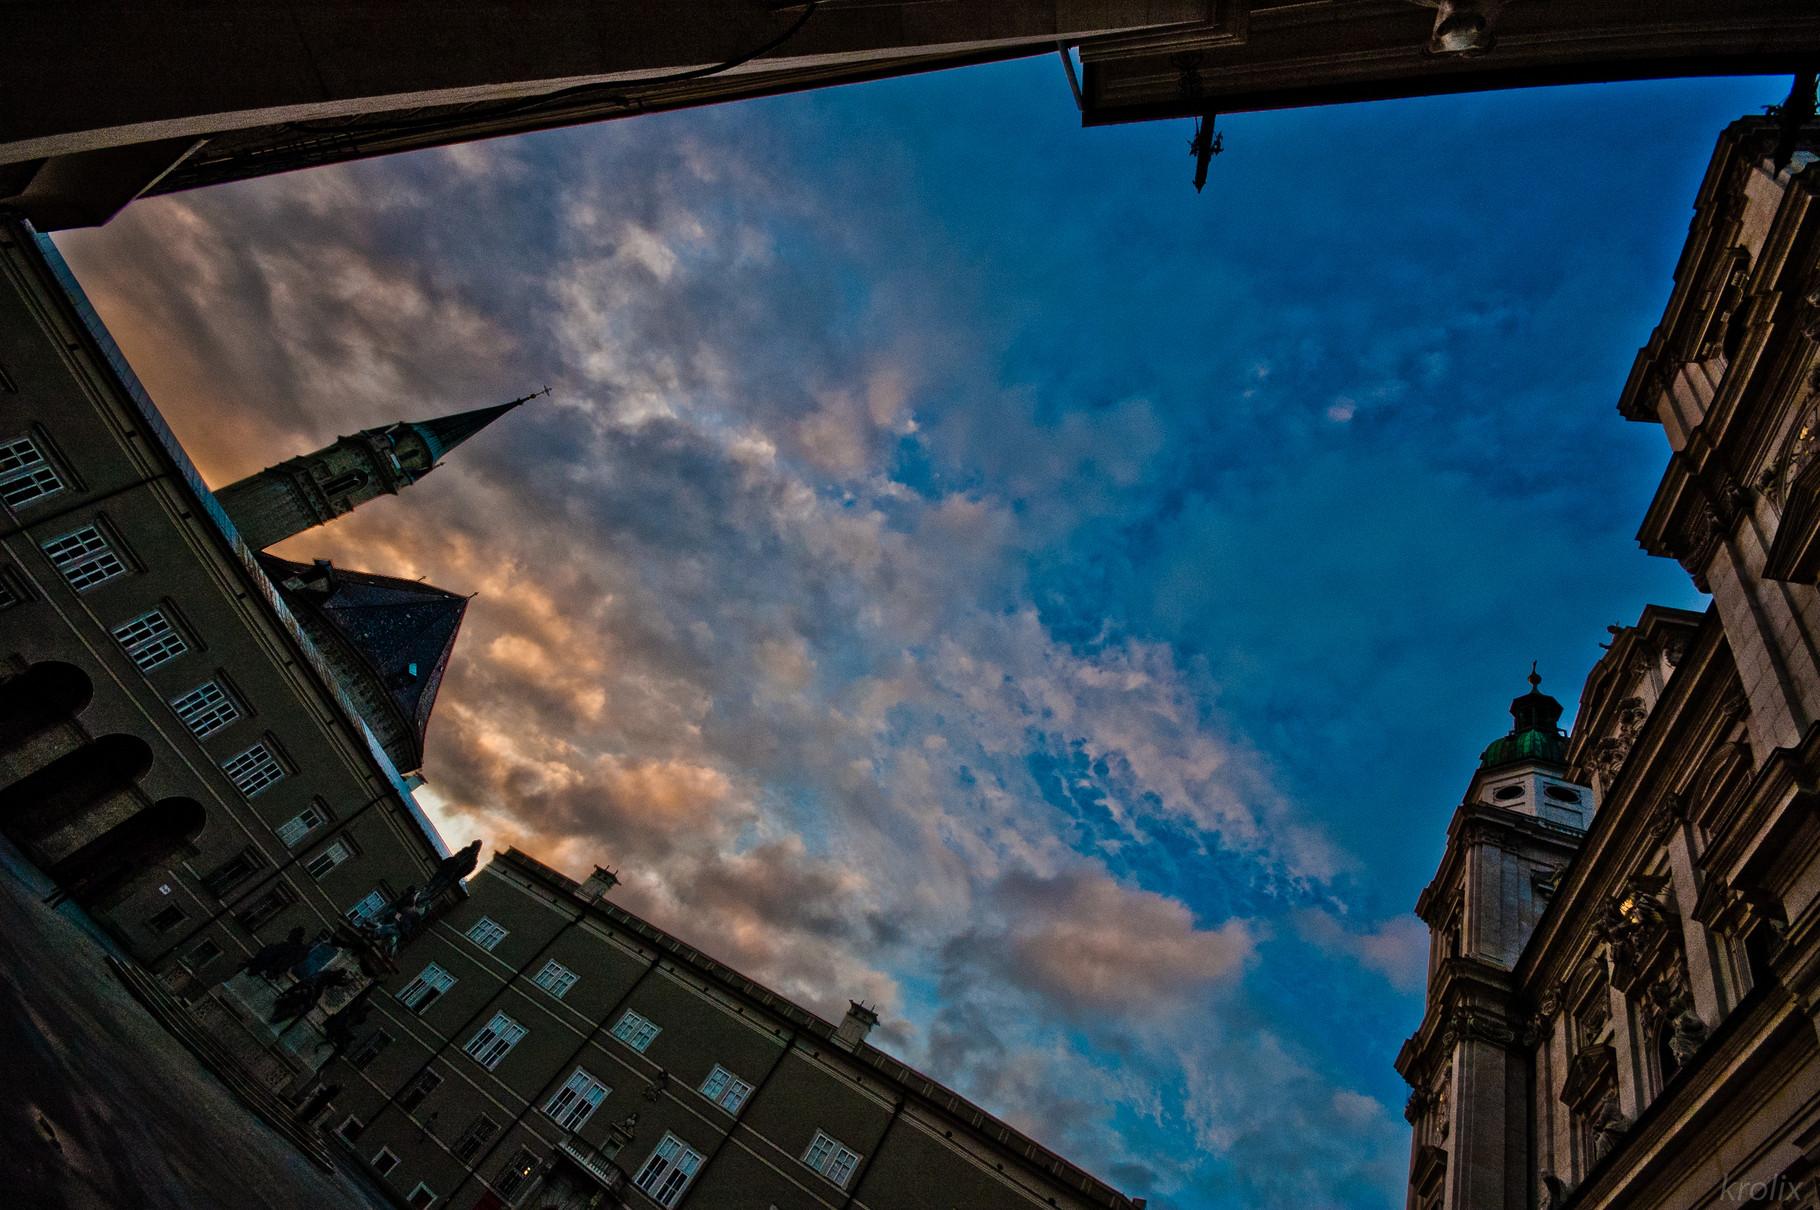 Домплац, кусочек предзакатного неба